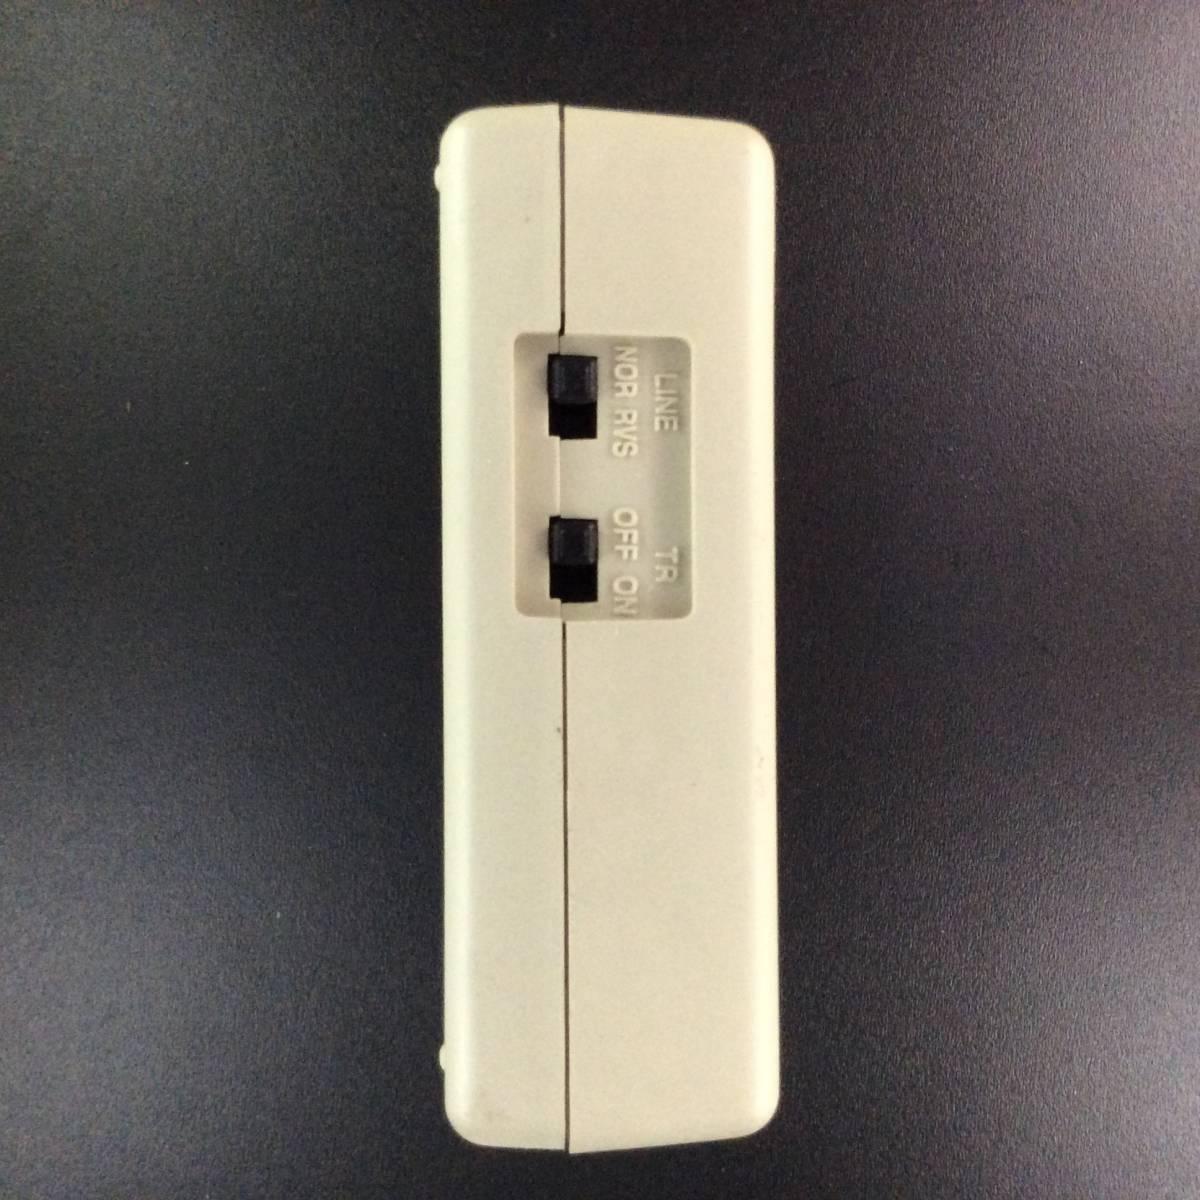 ★☆★ NTT 西日本 SL-144K F DSU-E〈R〉★☆★ 一度使用 美品 ★☆★ISDN DSU I-DSU64VB デジタル回線接続装置 _画像6